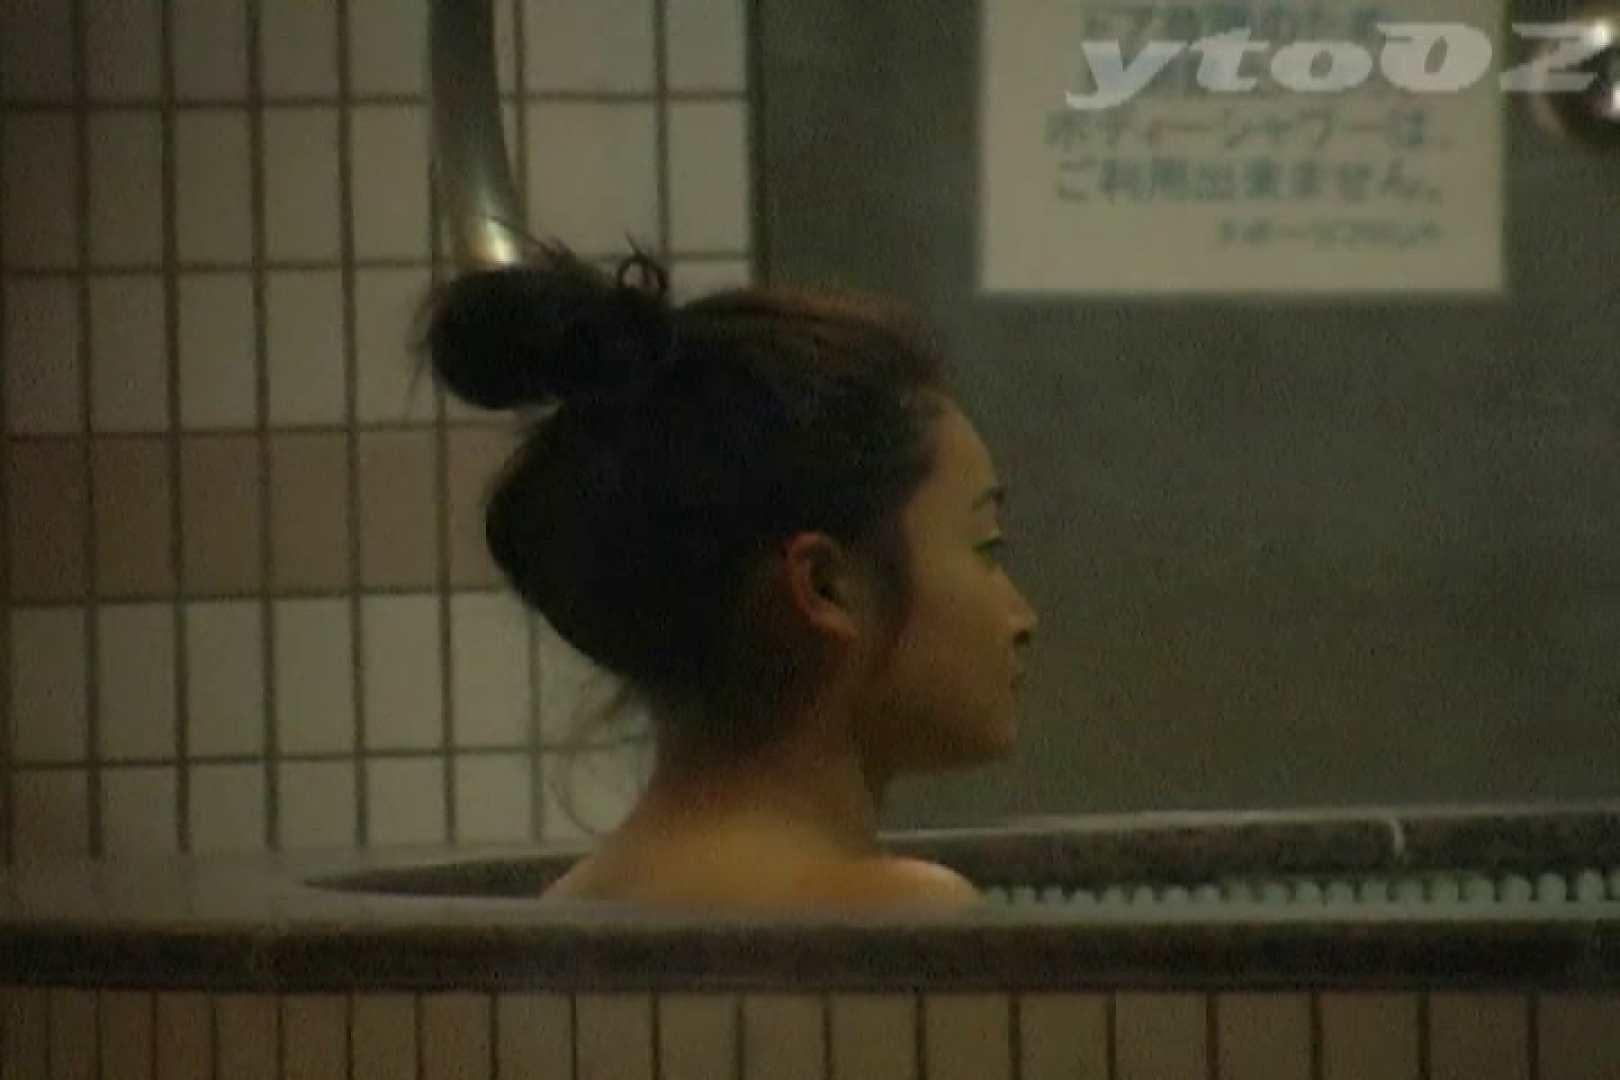 ▲復活限定▲合宿ホテル女風呂盗撮 Vol.11 入浴  79pic 74